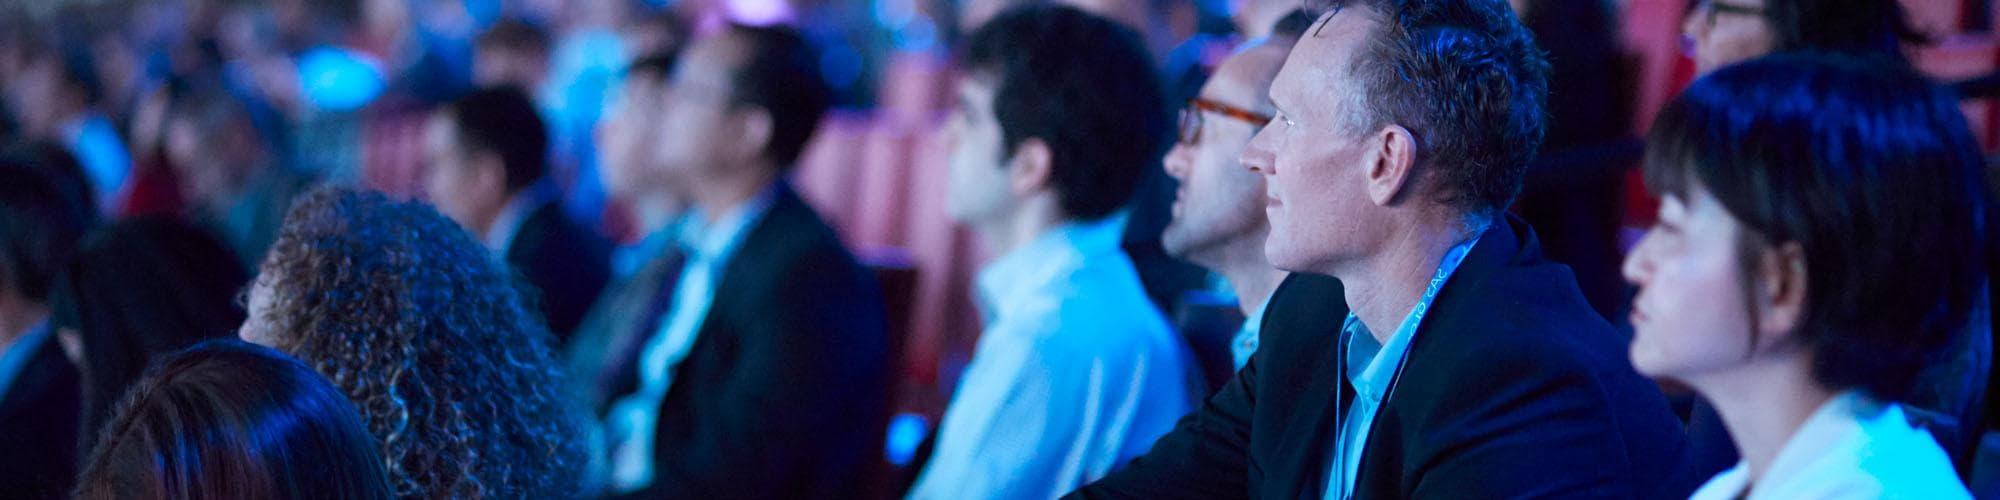 SAS Global Forum crowd audience